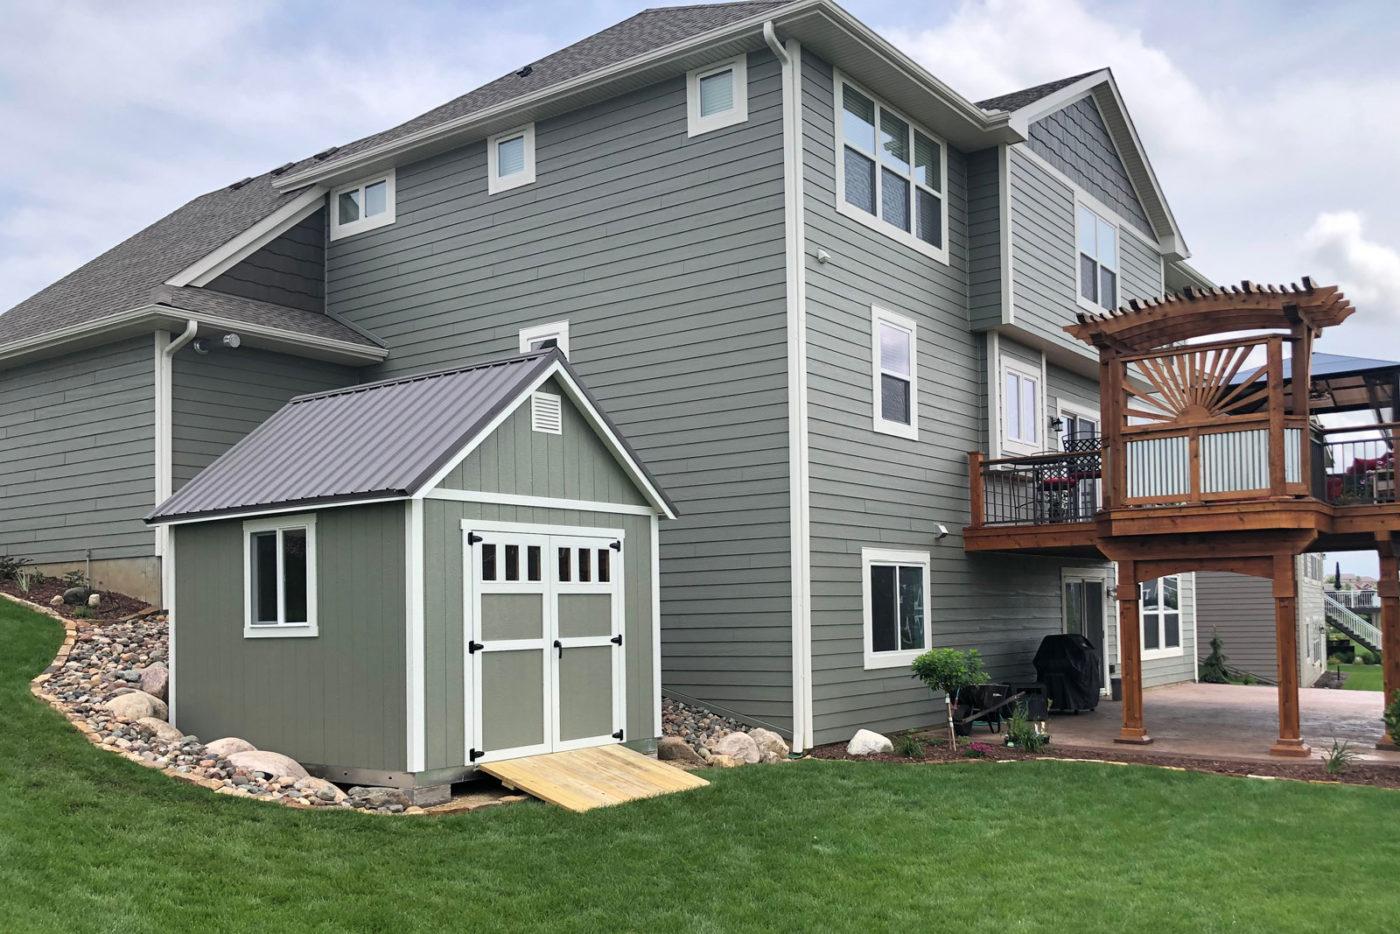 backyard storage sheds to match home